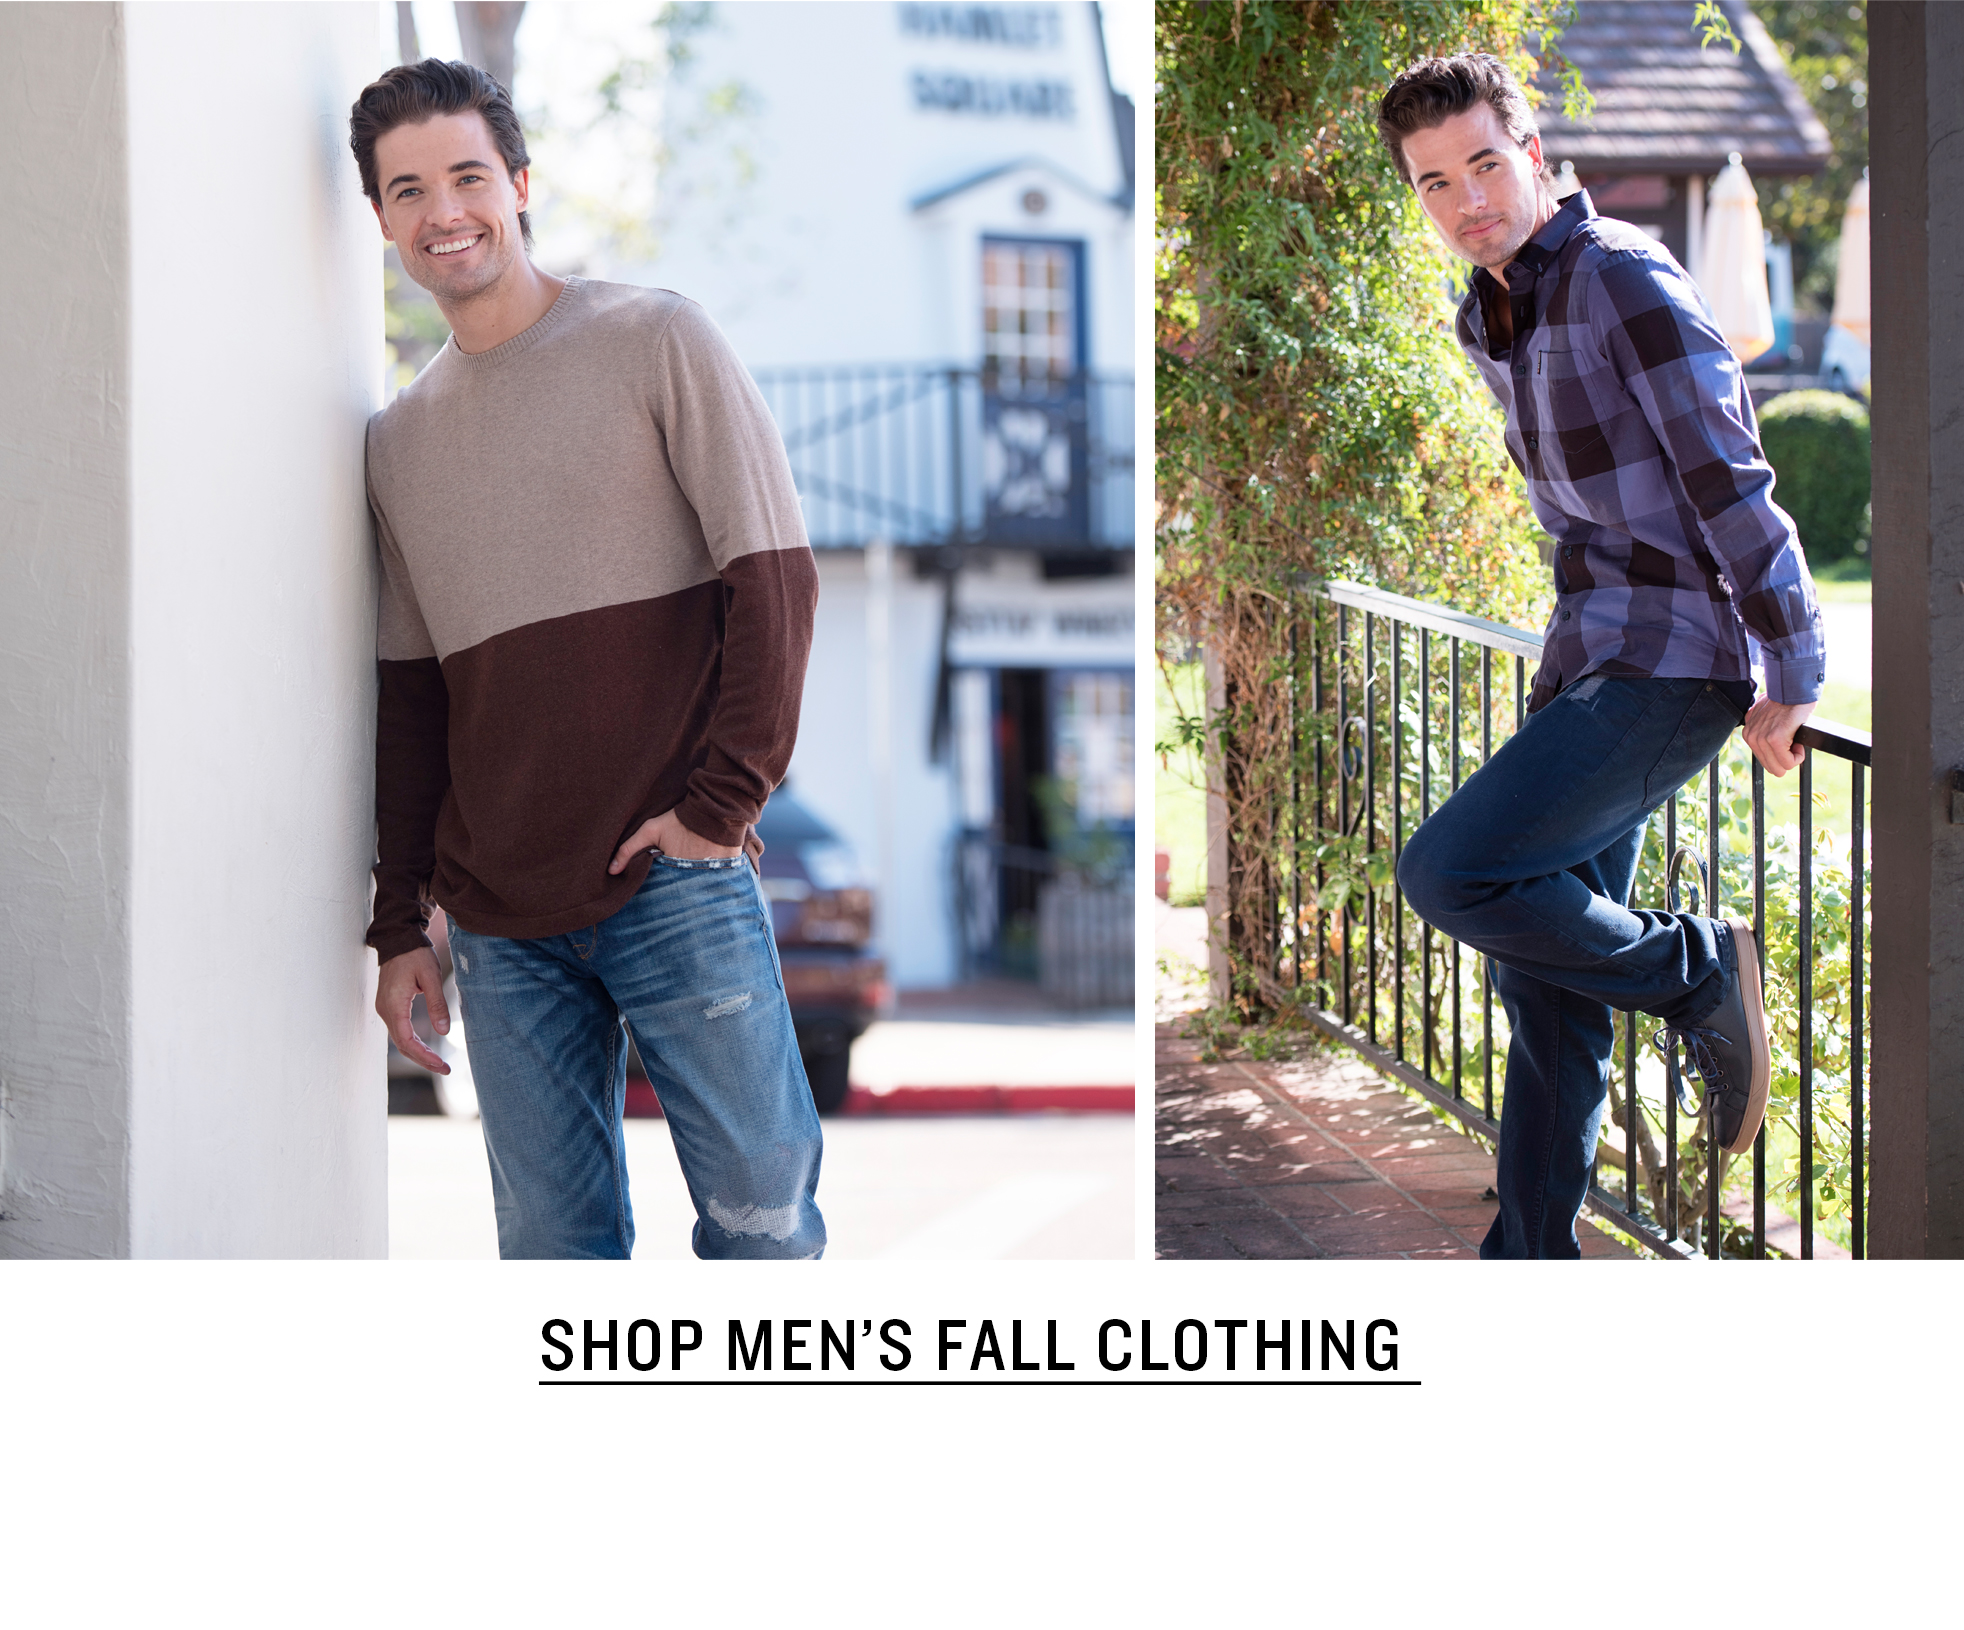 Men's Fall Clothing